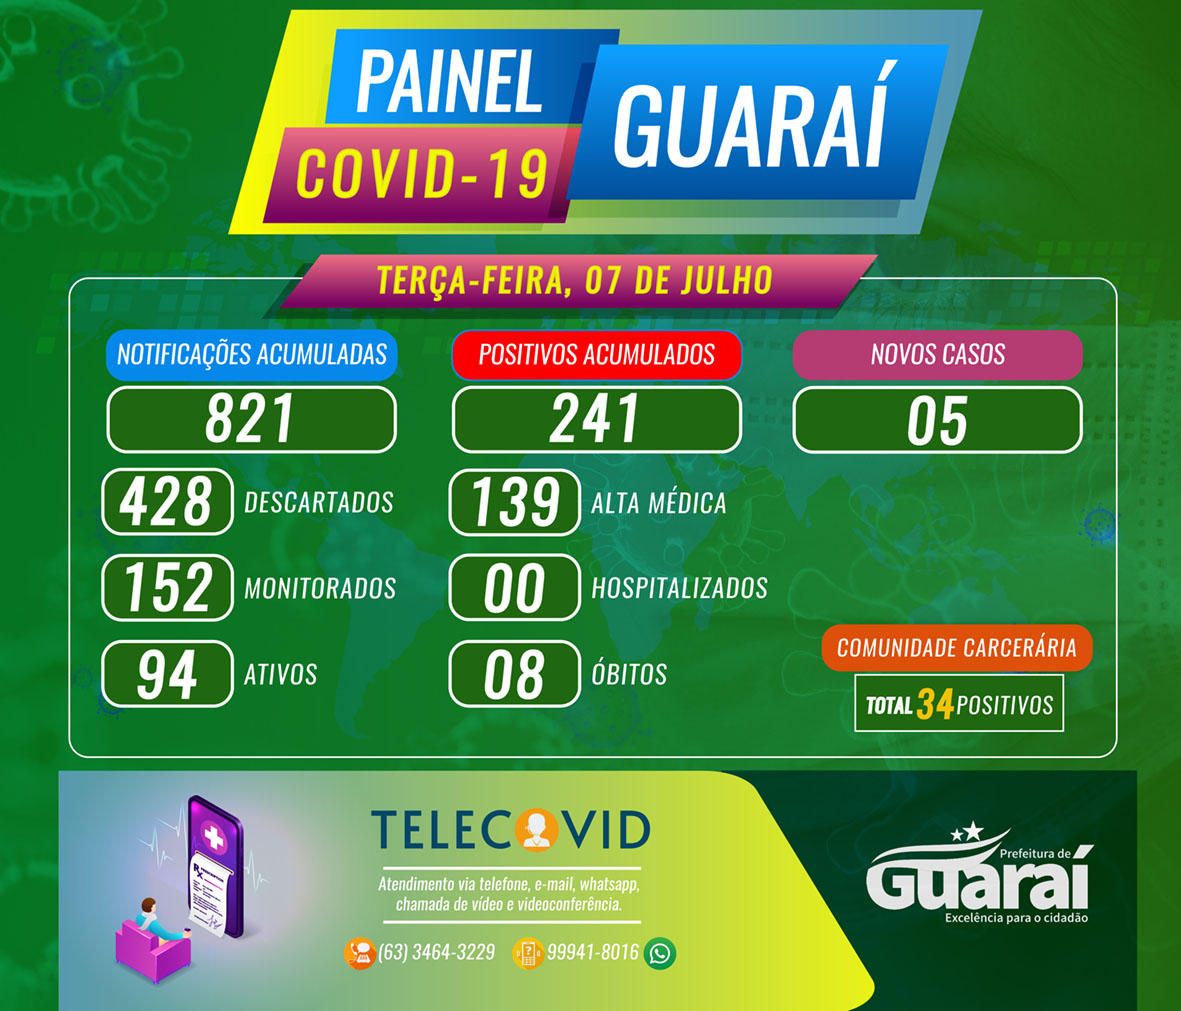 PAINEL GUARAI COVID19 TERÇA 7 DE JULHO - Painel Guaraí-TO / Covid-19 / Boletim 07 de Julho (Terça) 14:00